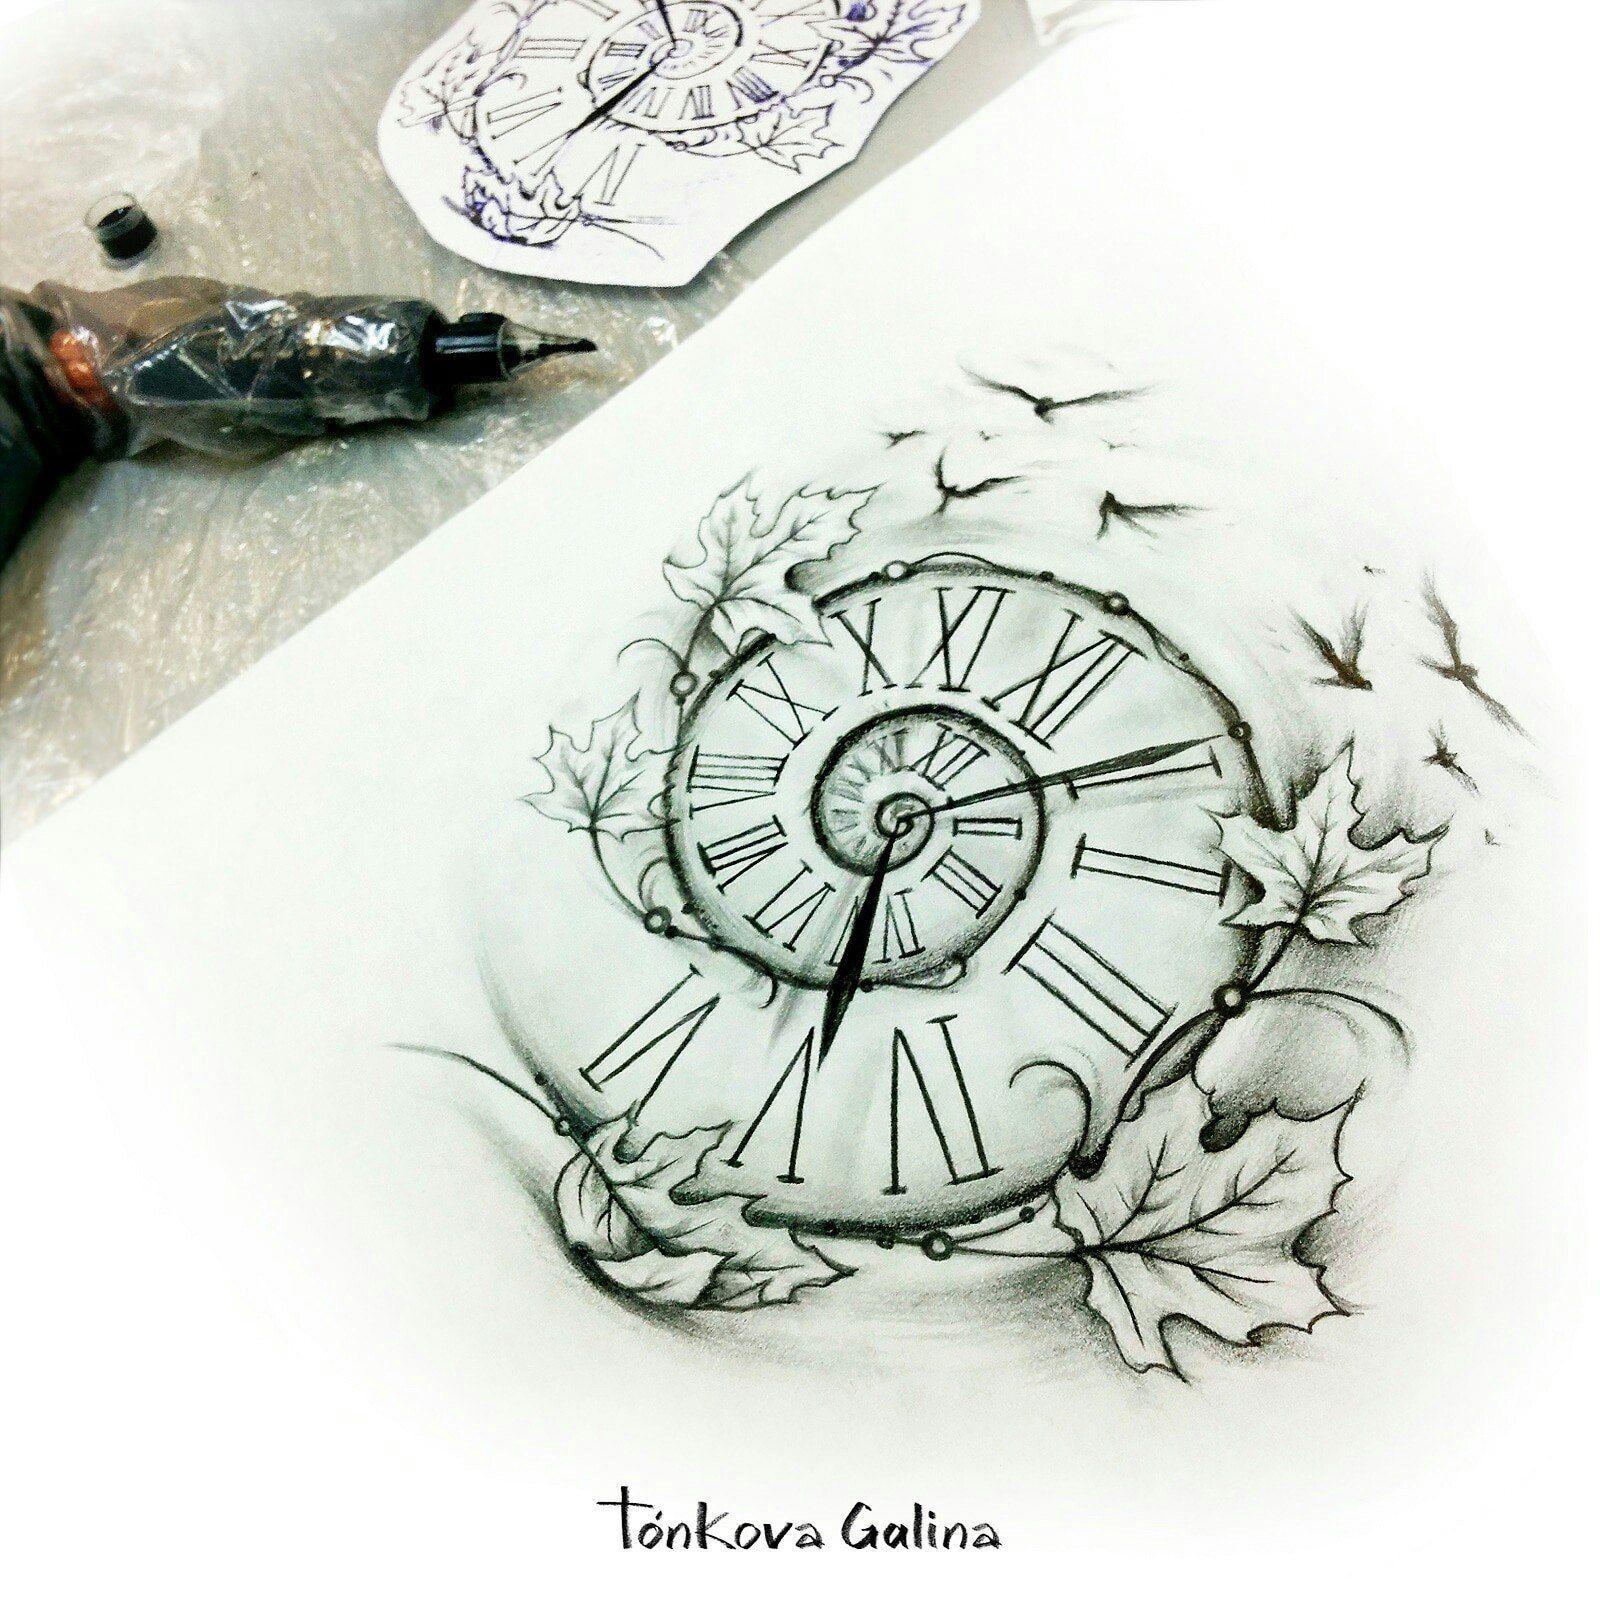 Regarder Tatouage Sur Illustrations Croquis Sur Papier Par Galina Tonkova In 2020 Watch Tattoos Tattoos Pocket Watch Tattoos